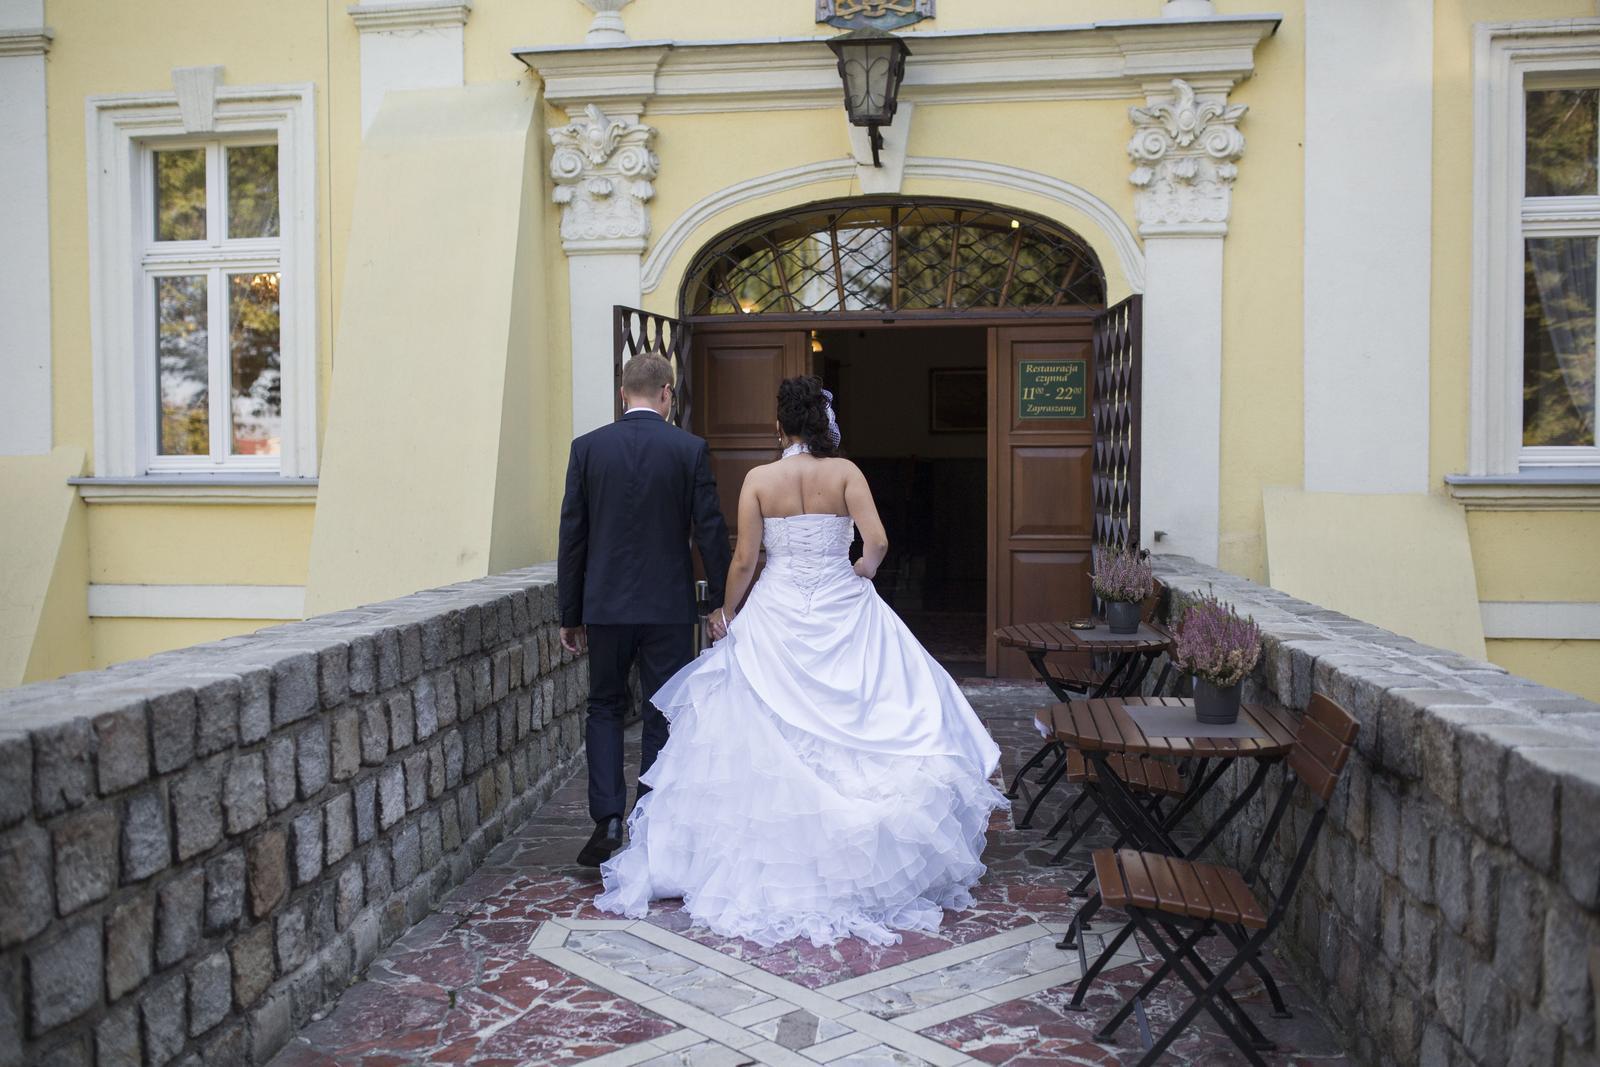 Svadobné šaty vyšívané perličkami - veľ. 38-42 - Obrázek č. 4